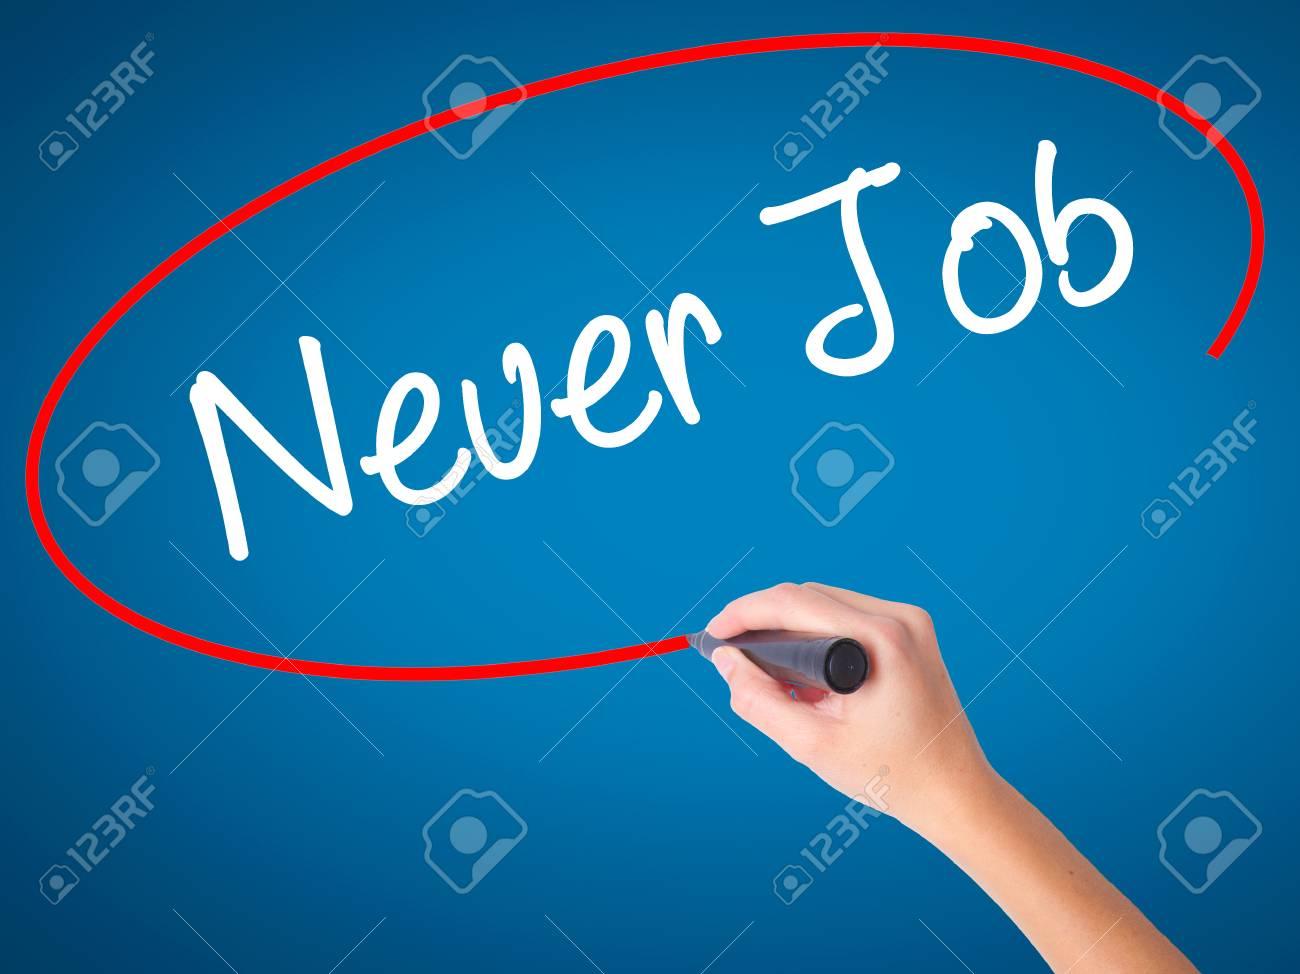 Women Hand Writing Neuer Job New Job In German With Black Stock